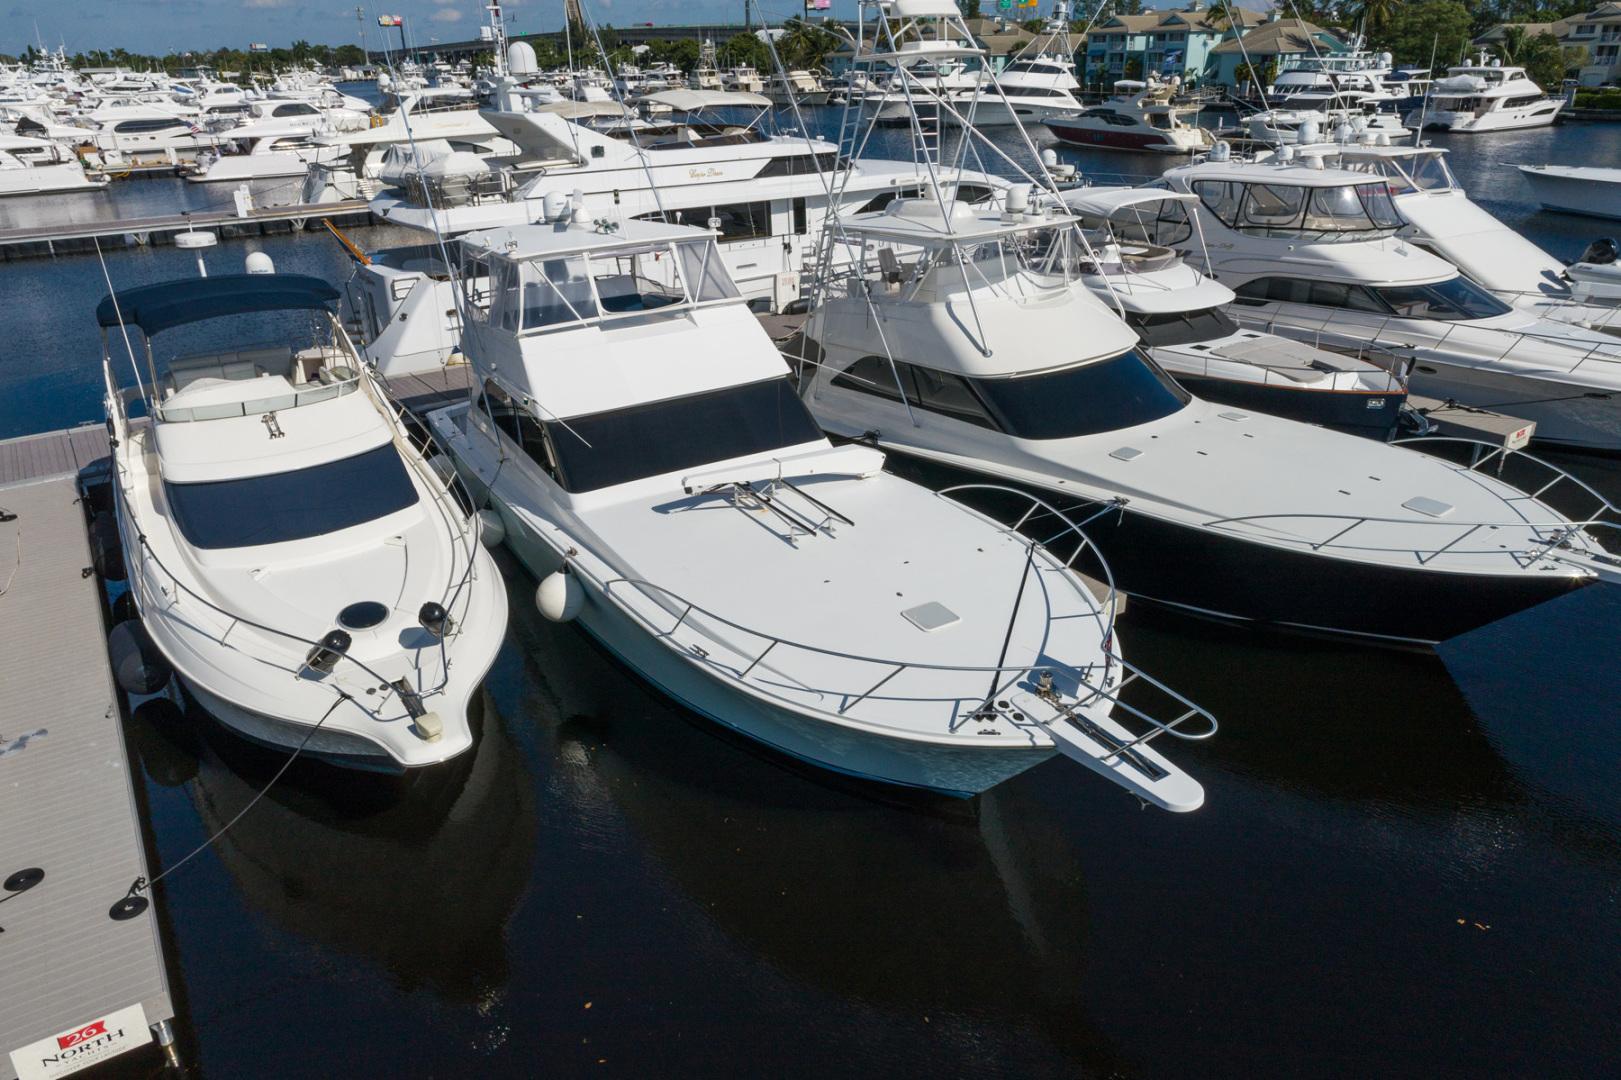 Viking-Convertible 2000-Knotty Girl Fort Lauderdale-Florida-United States-1564788   Thumbnail